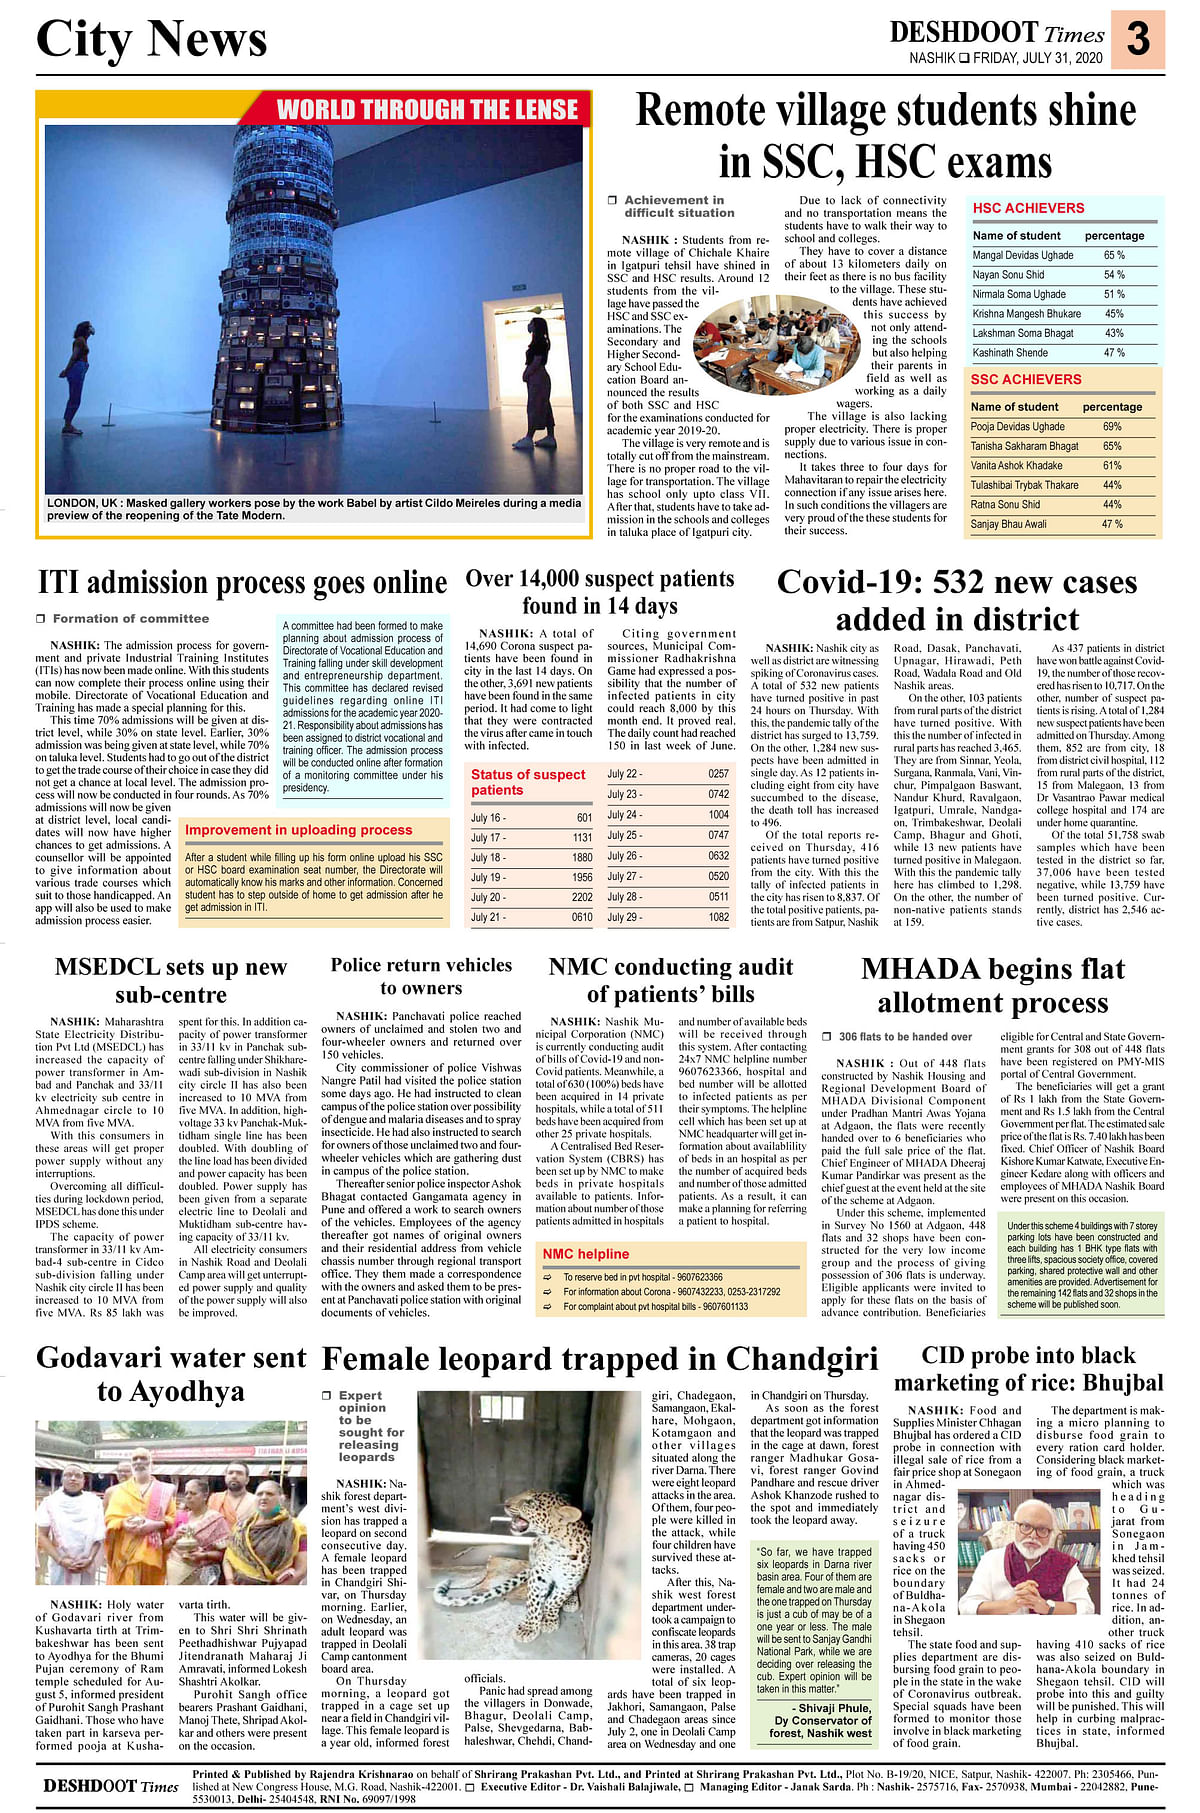 Deshdoot Times E Paper, 31 July 2020